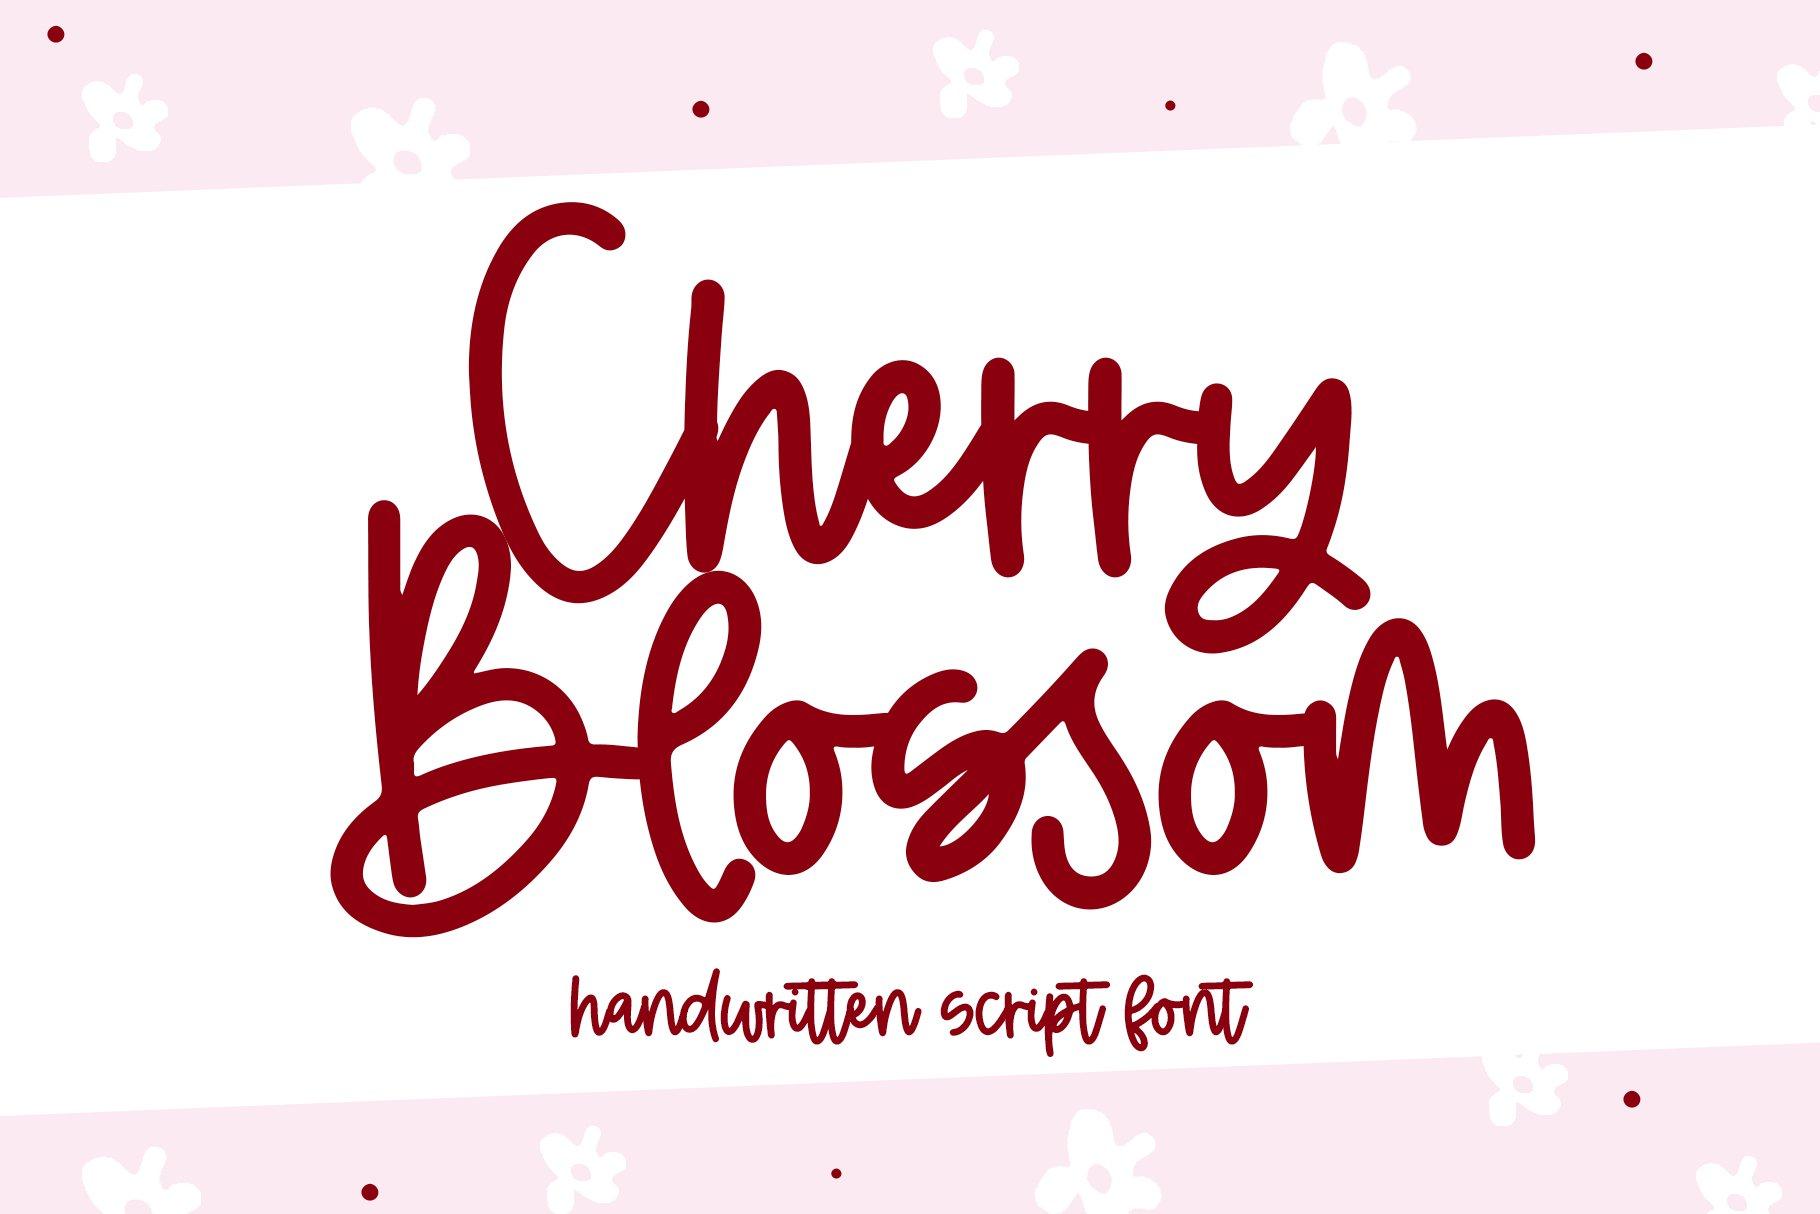 Cherry Blossom - A Handwritten Script Font example image 1